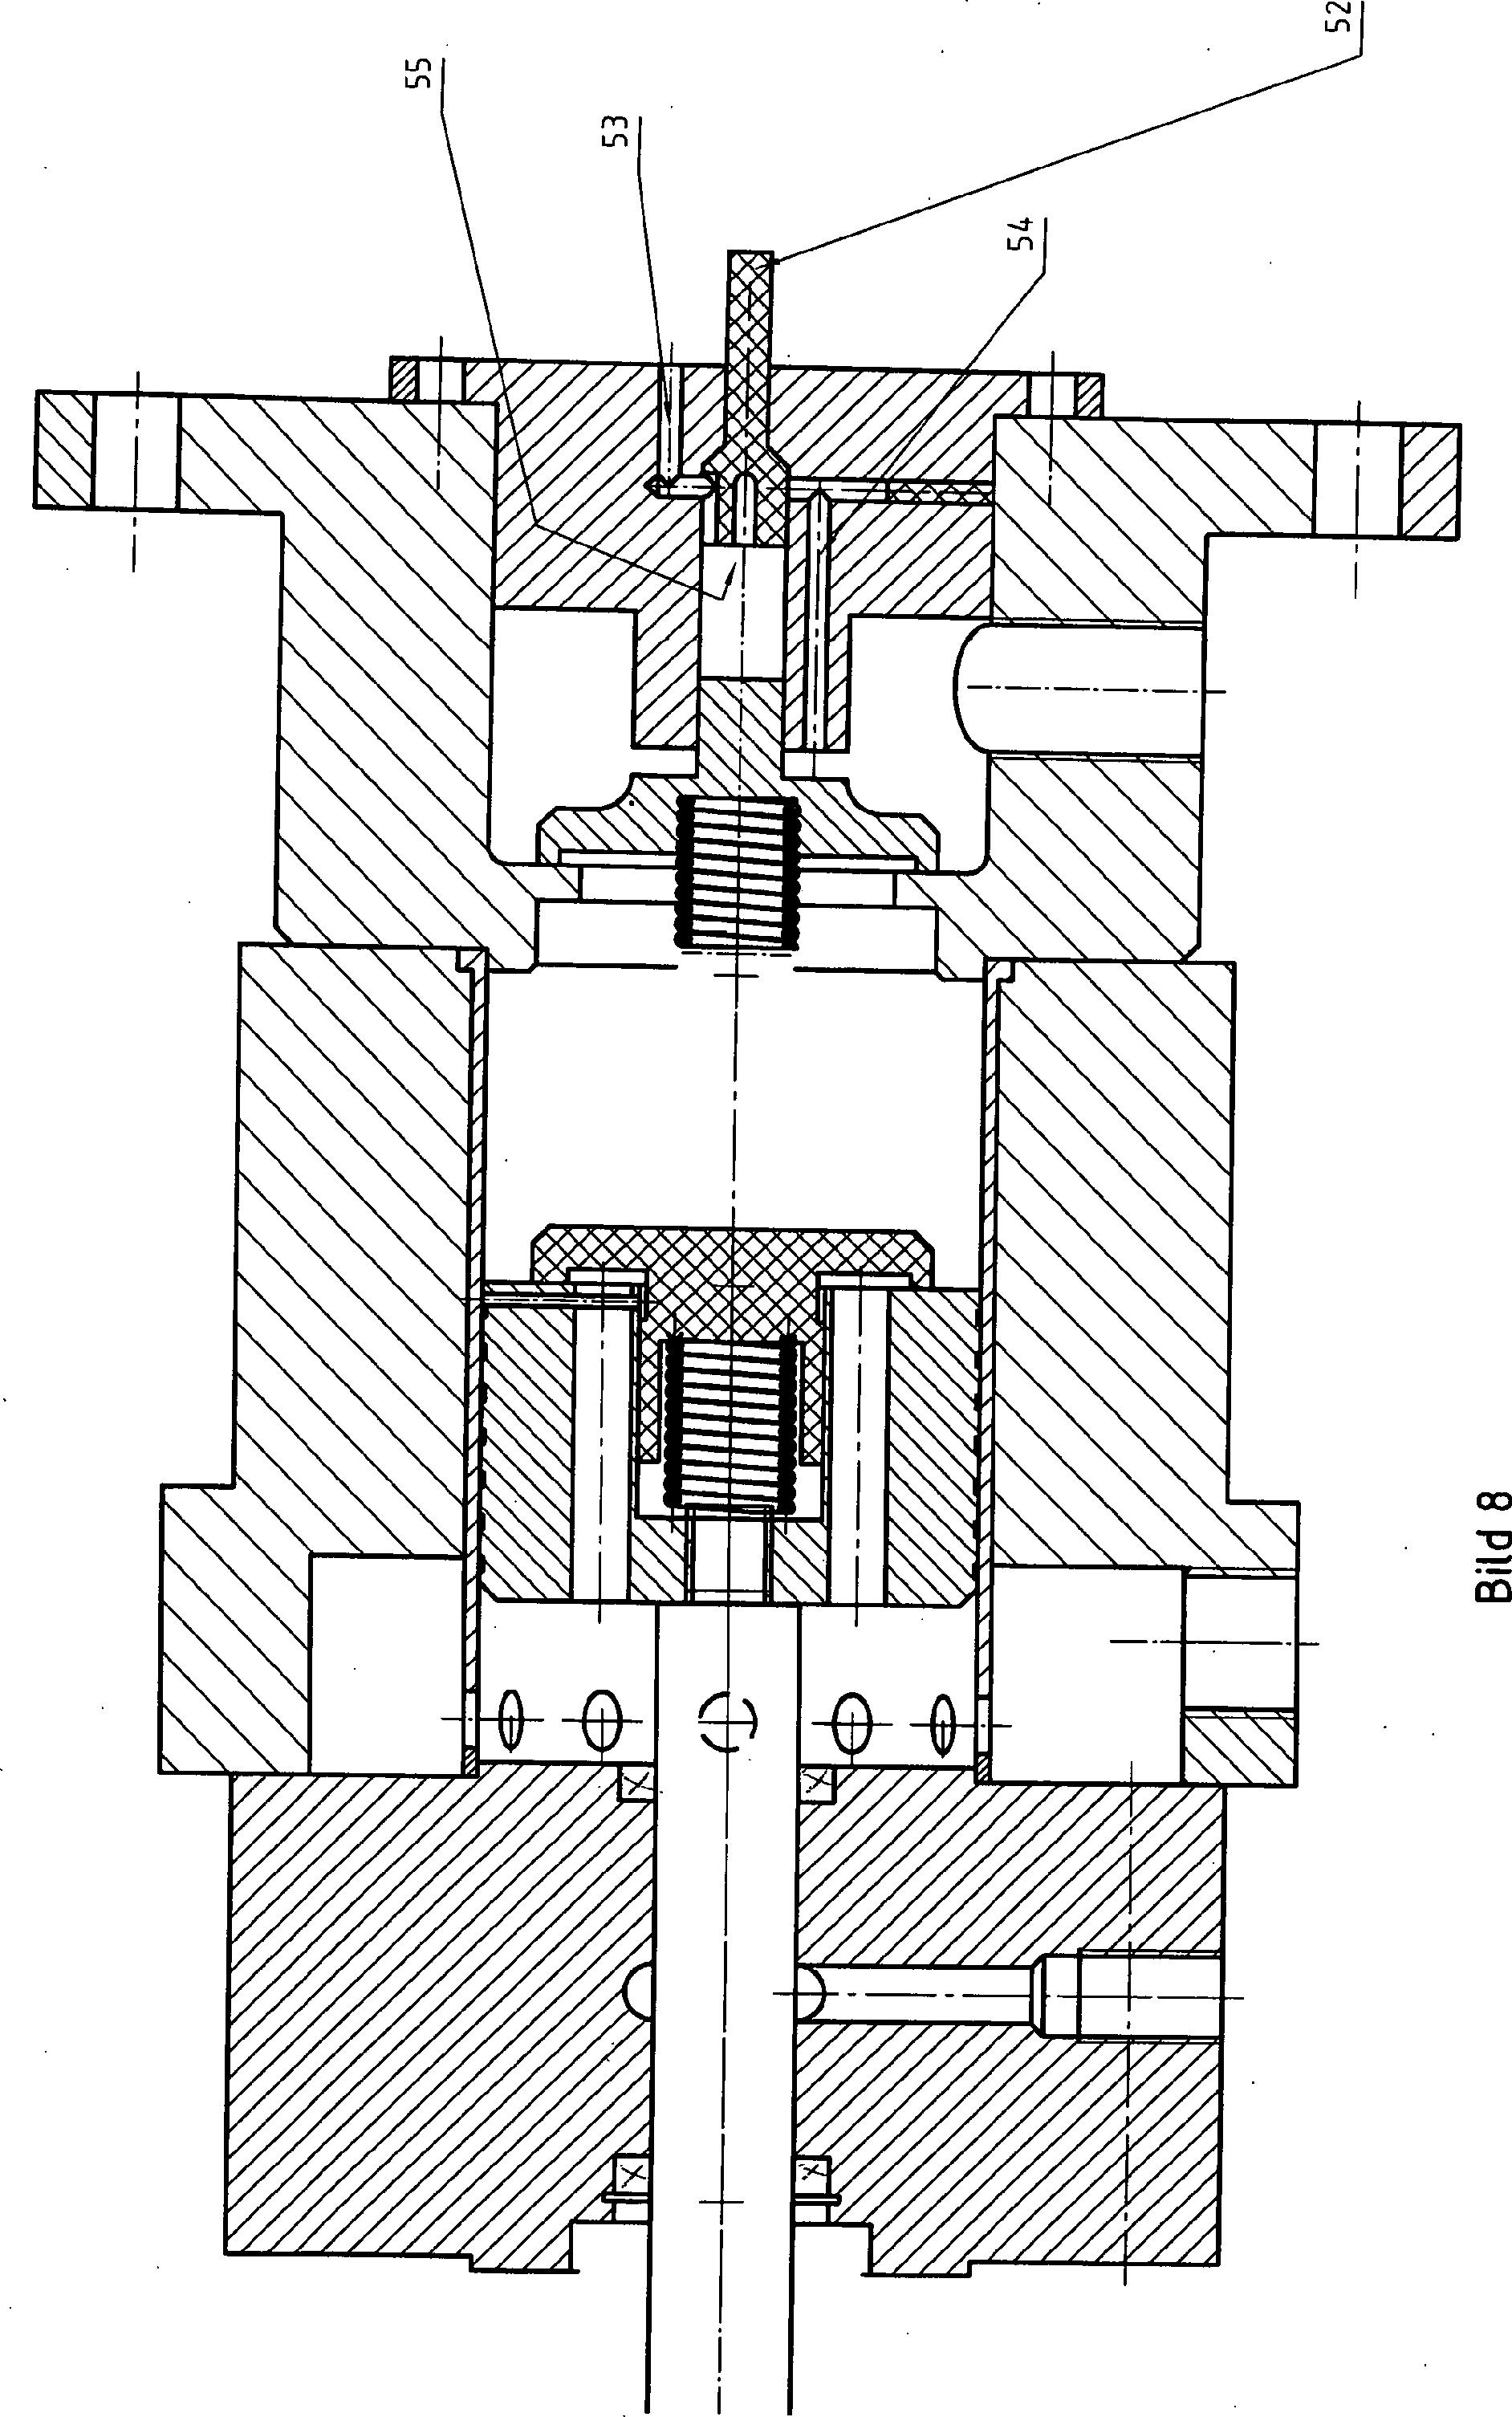 Unusual Wiring Diagram Suzuki Rf900r Ideas - Electrical Circuit ...